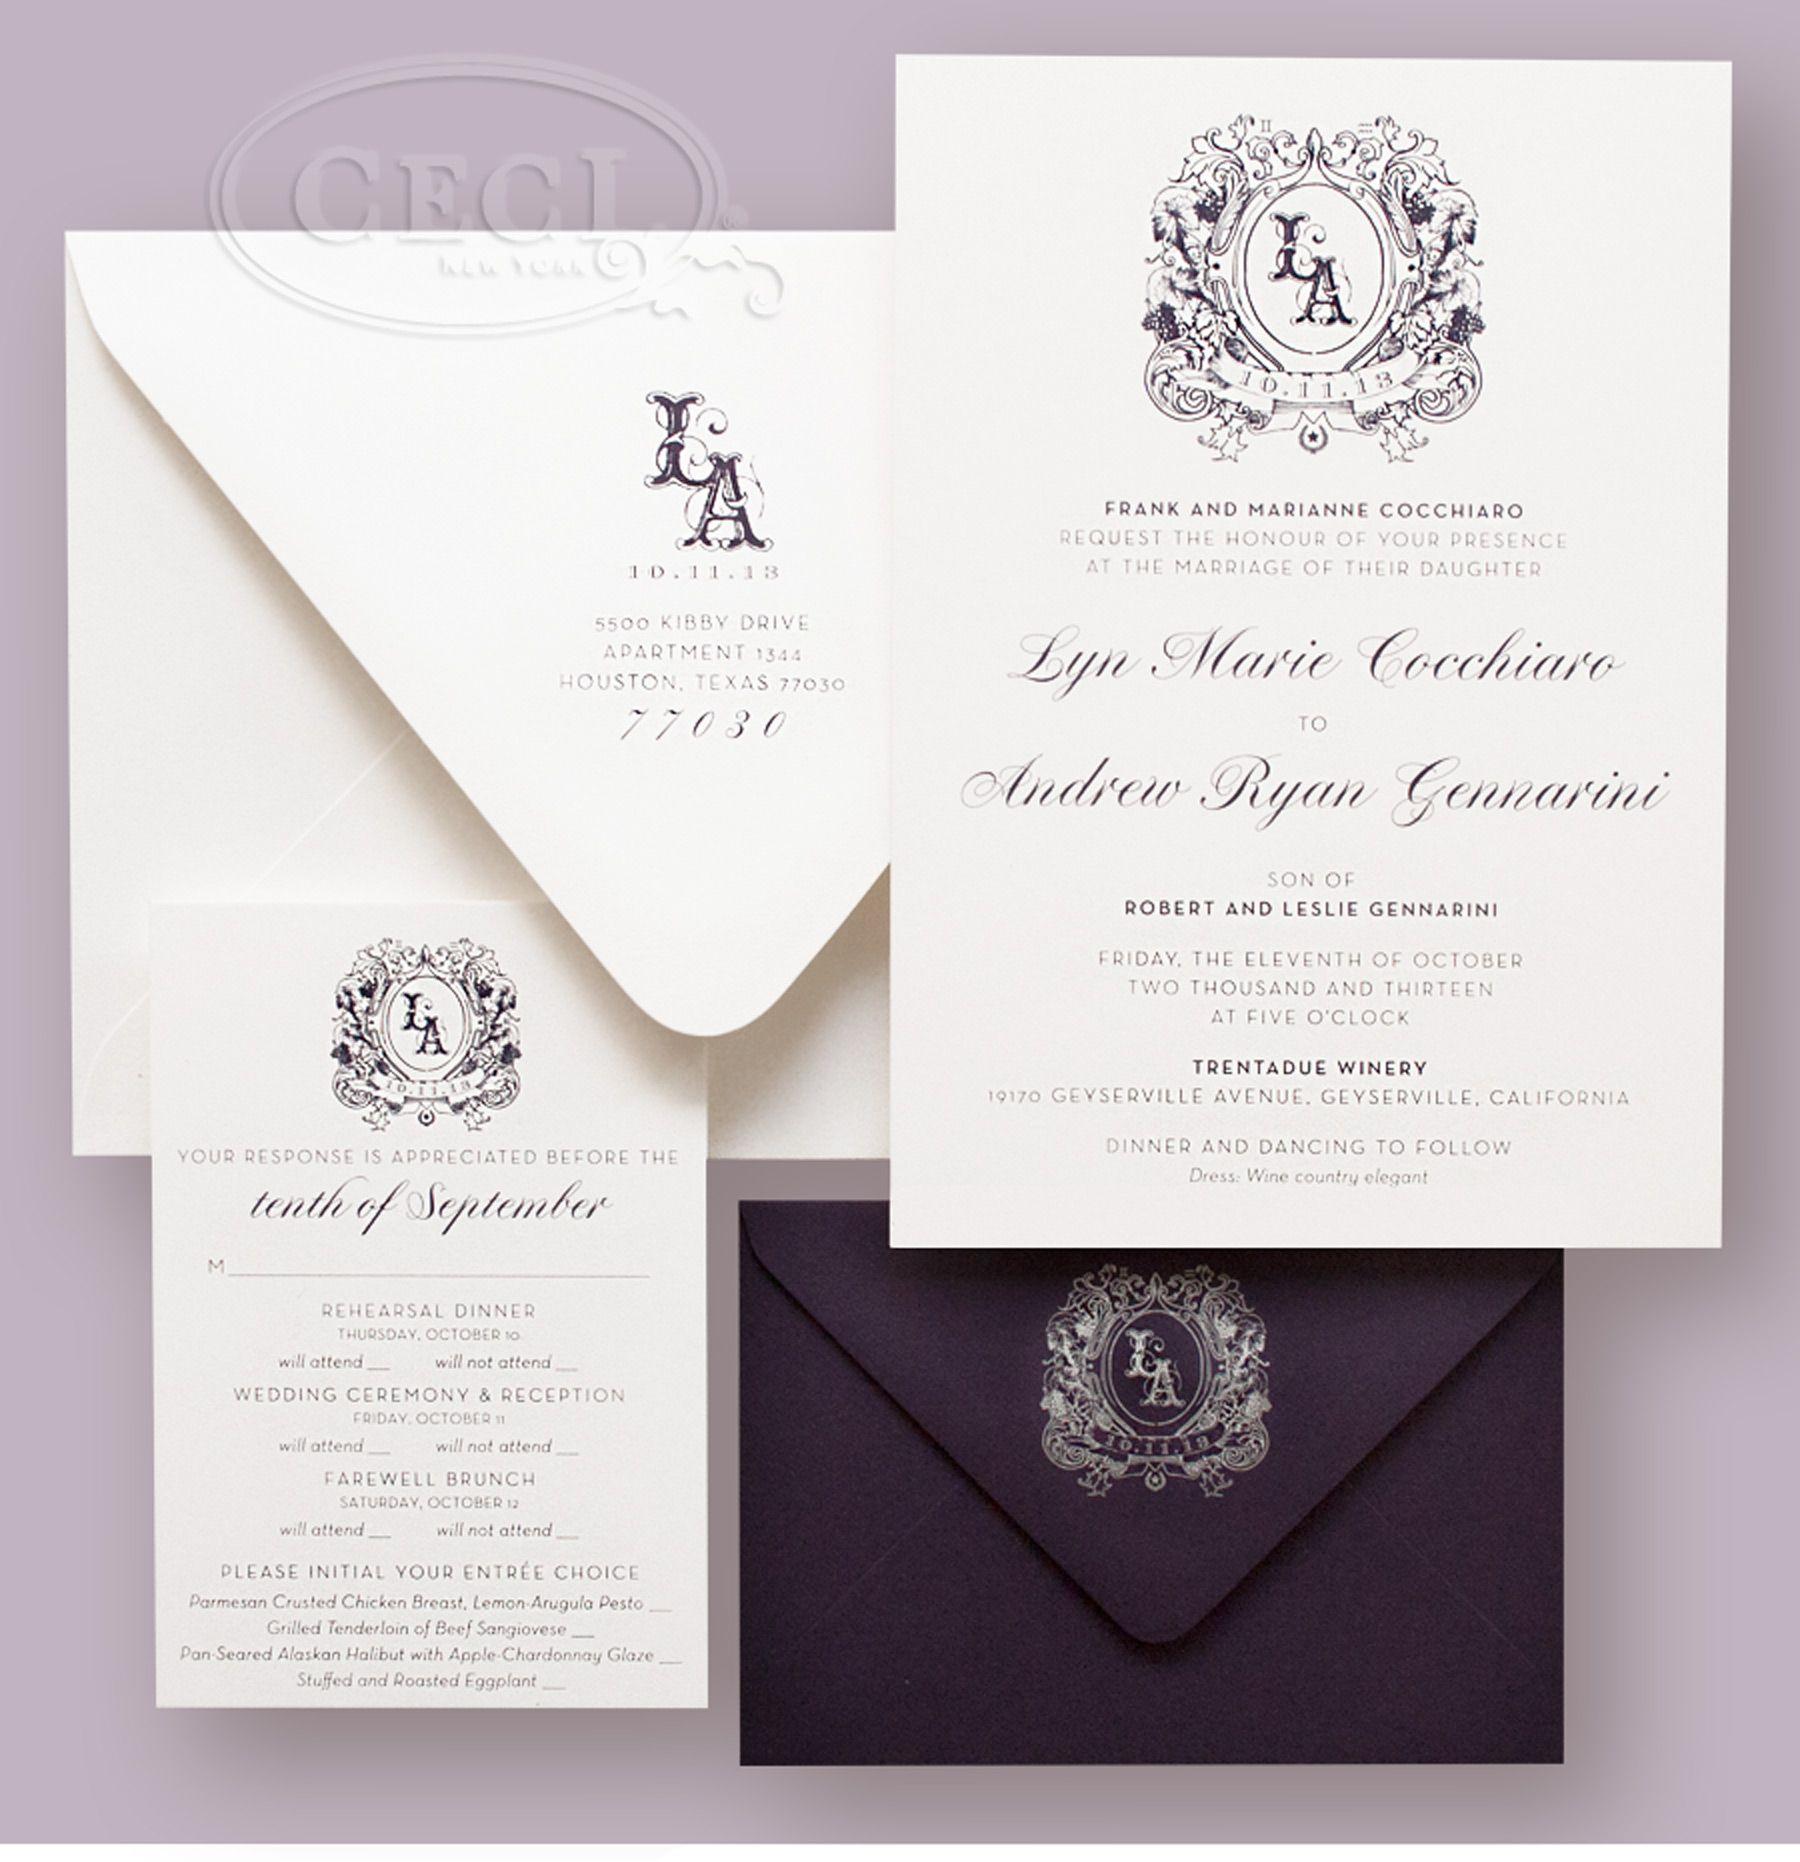 luxury wedding invitations by ceci new york our muse With luxury wedding invitations california